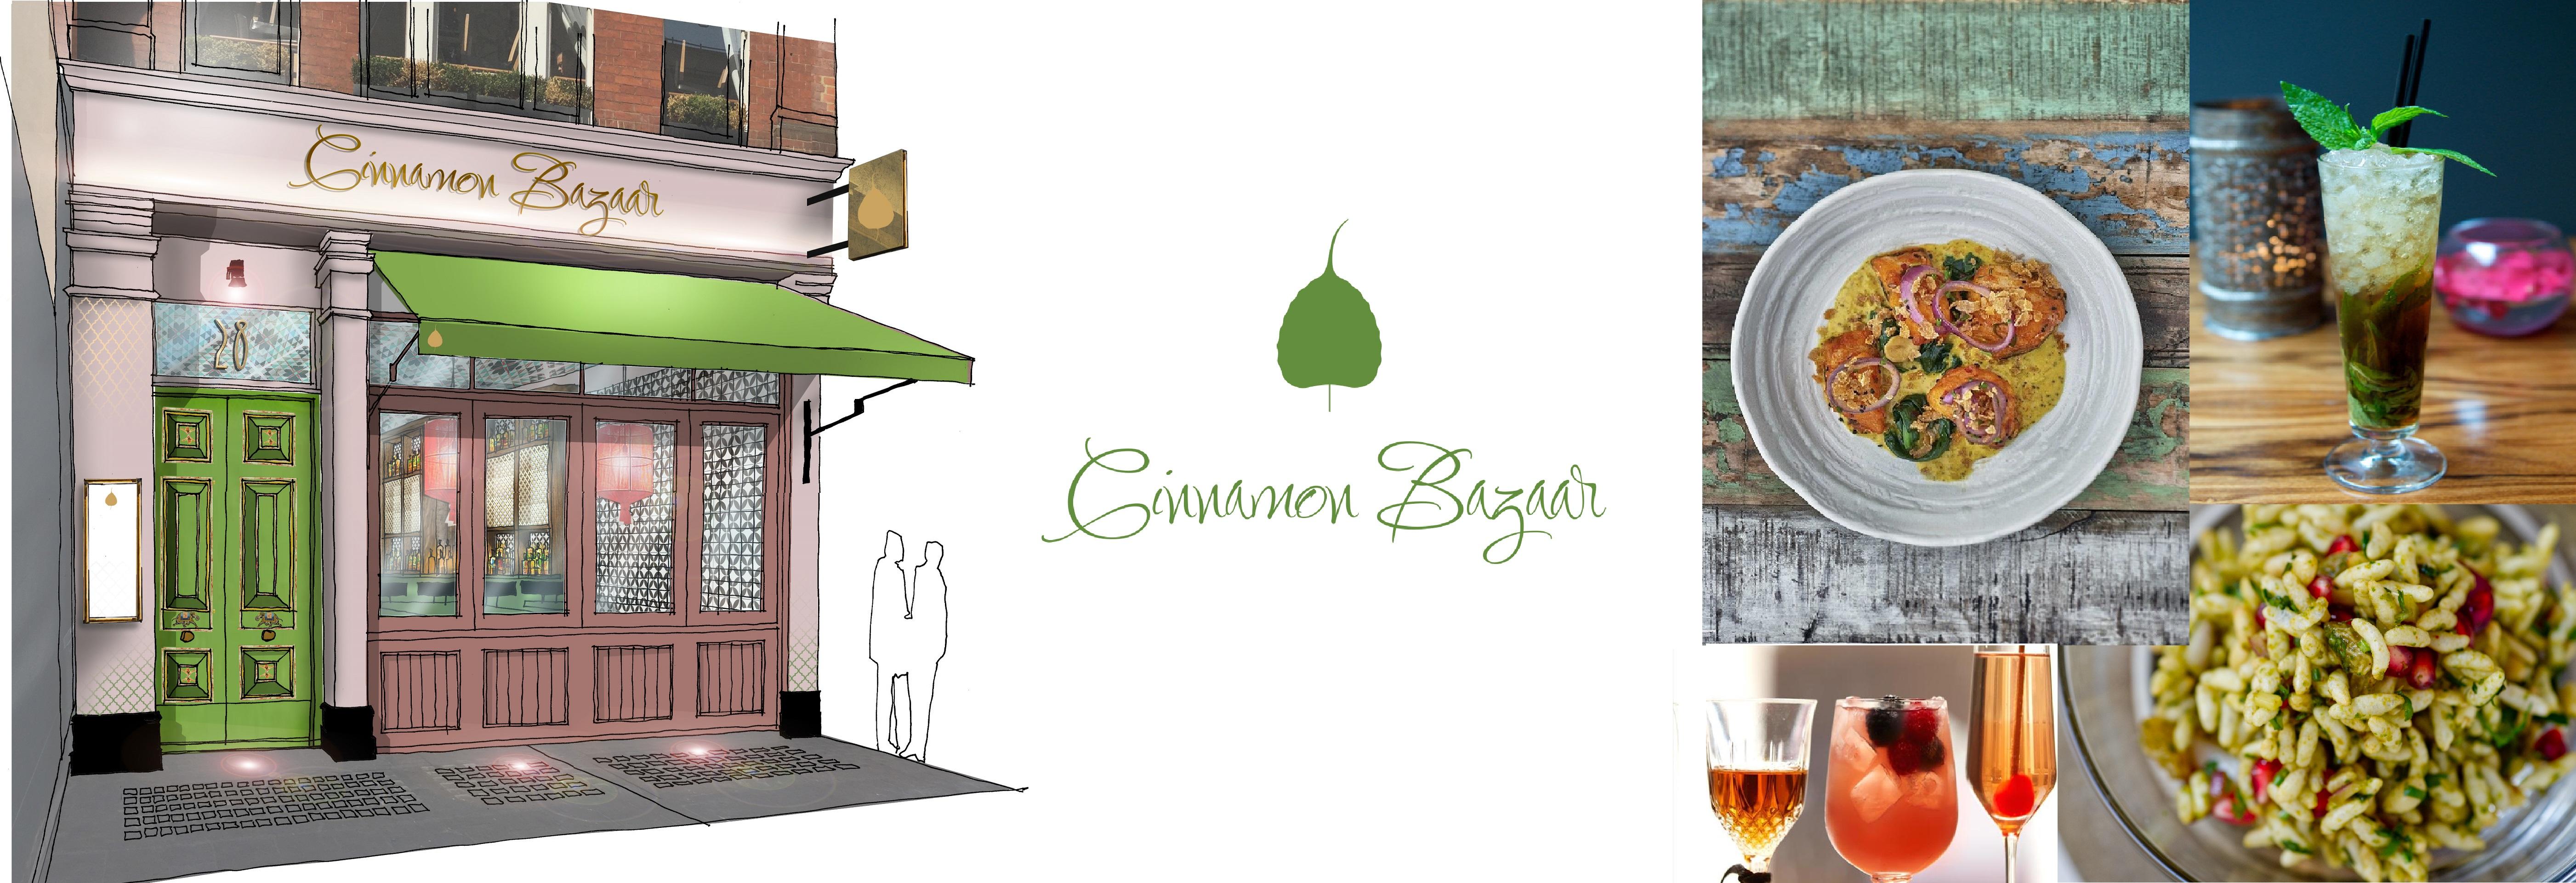 cinnamon bazaar VIS 01rev